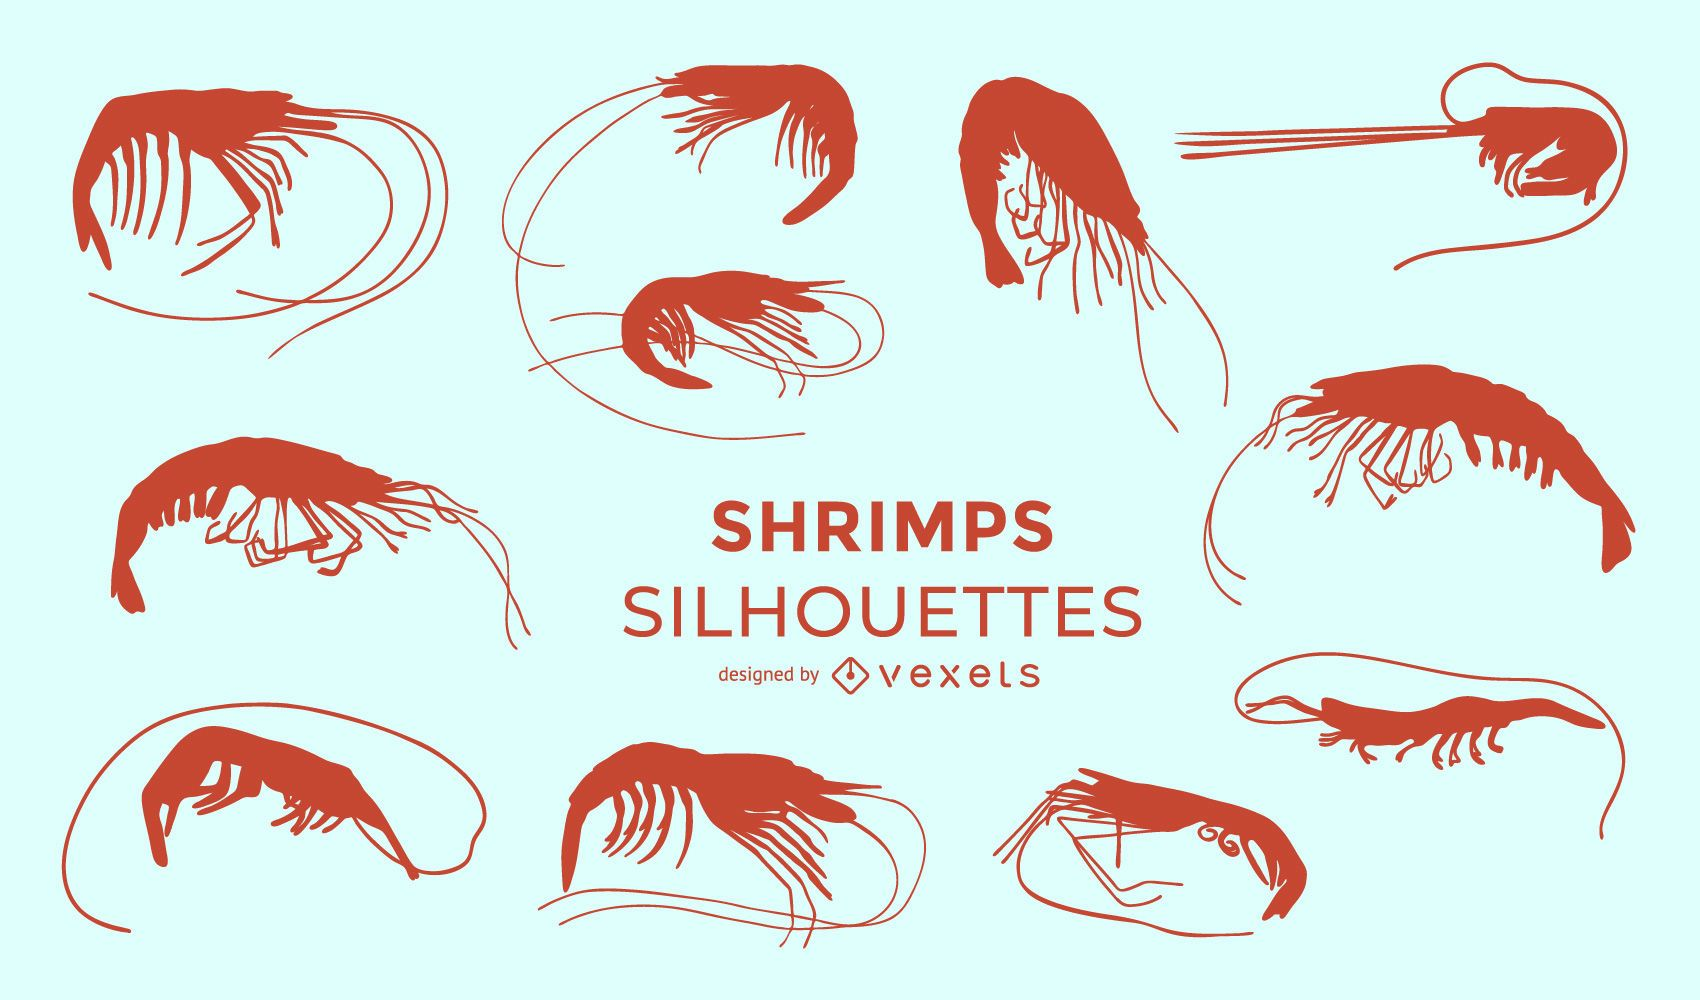 Shrimps silhouette collection